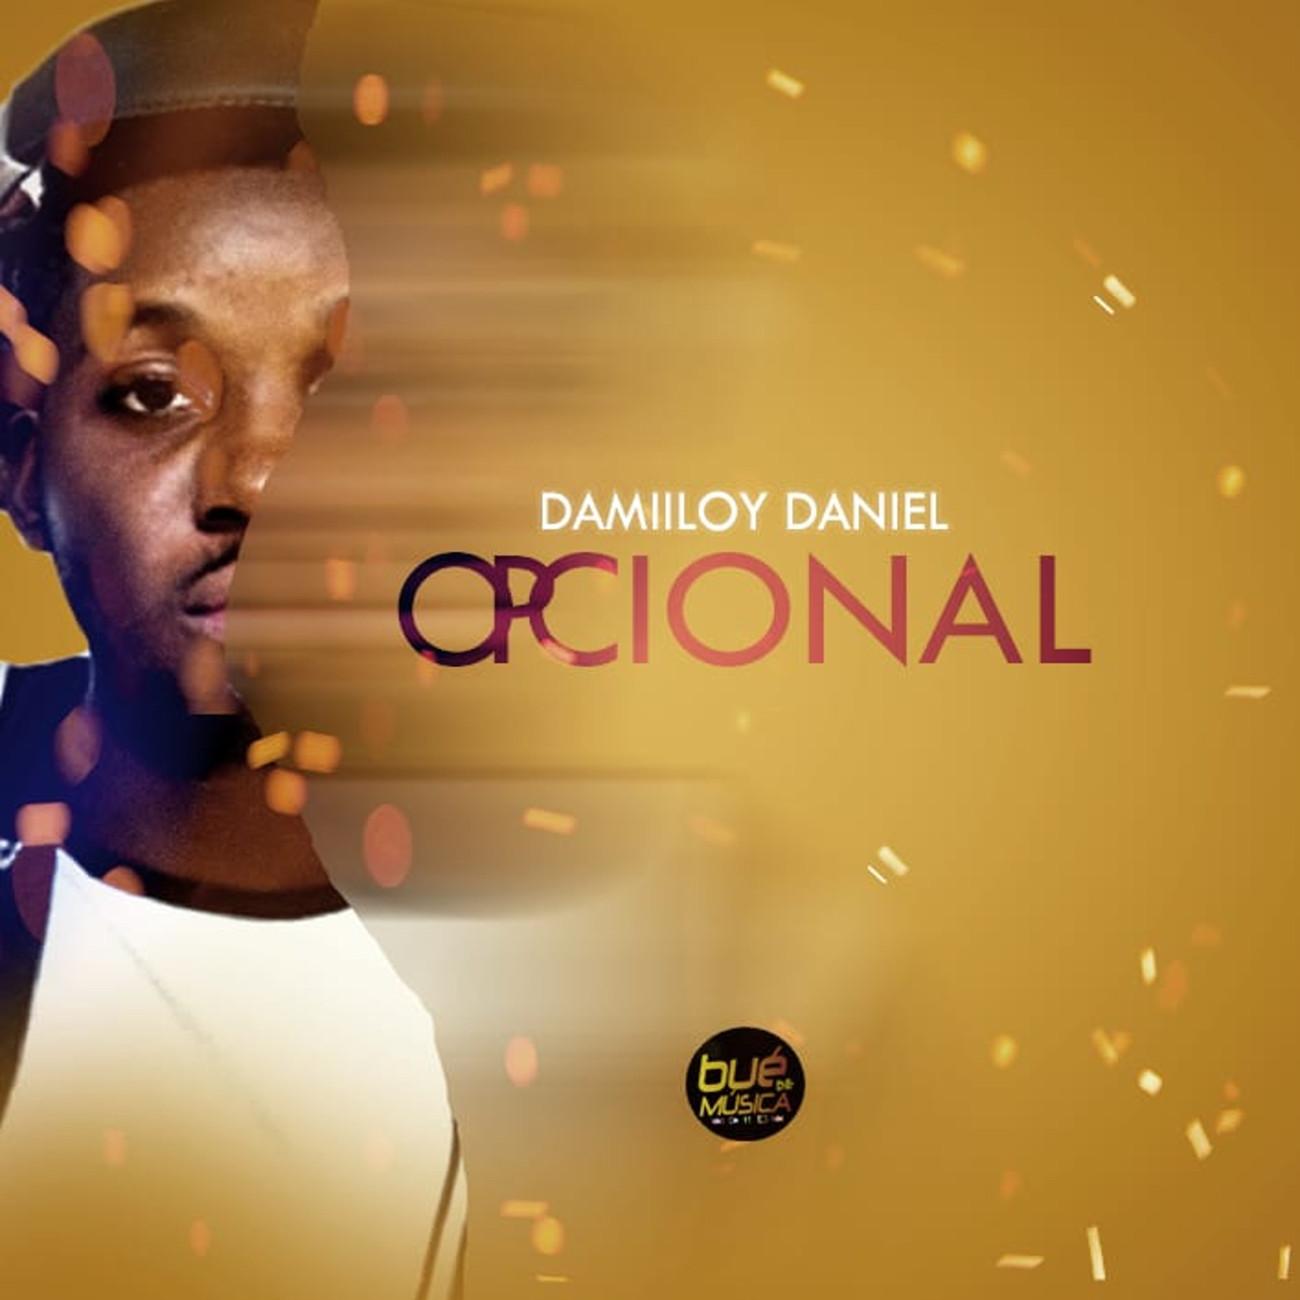 Dj Damiloy Daniel Opcional - DJ Damiloy Daniel – Opcional